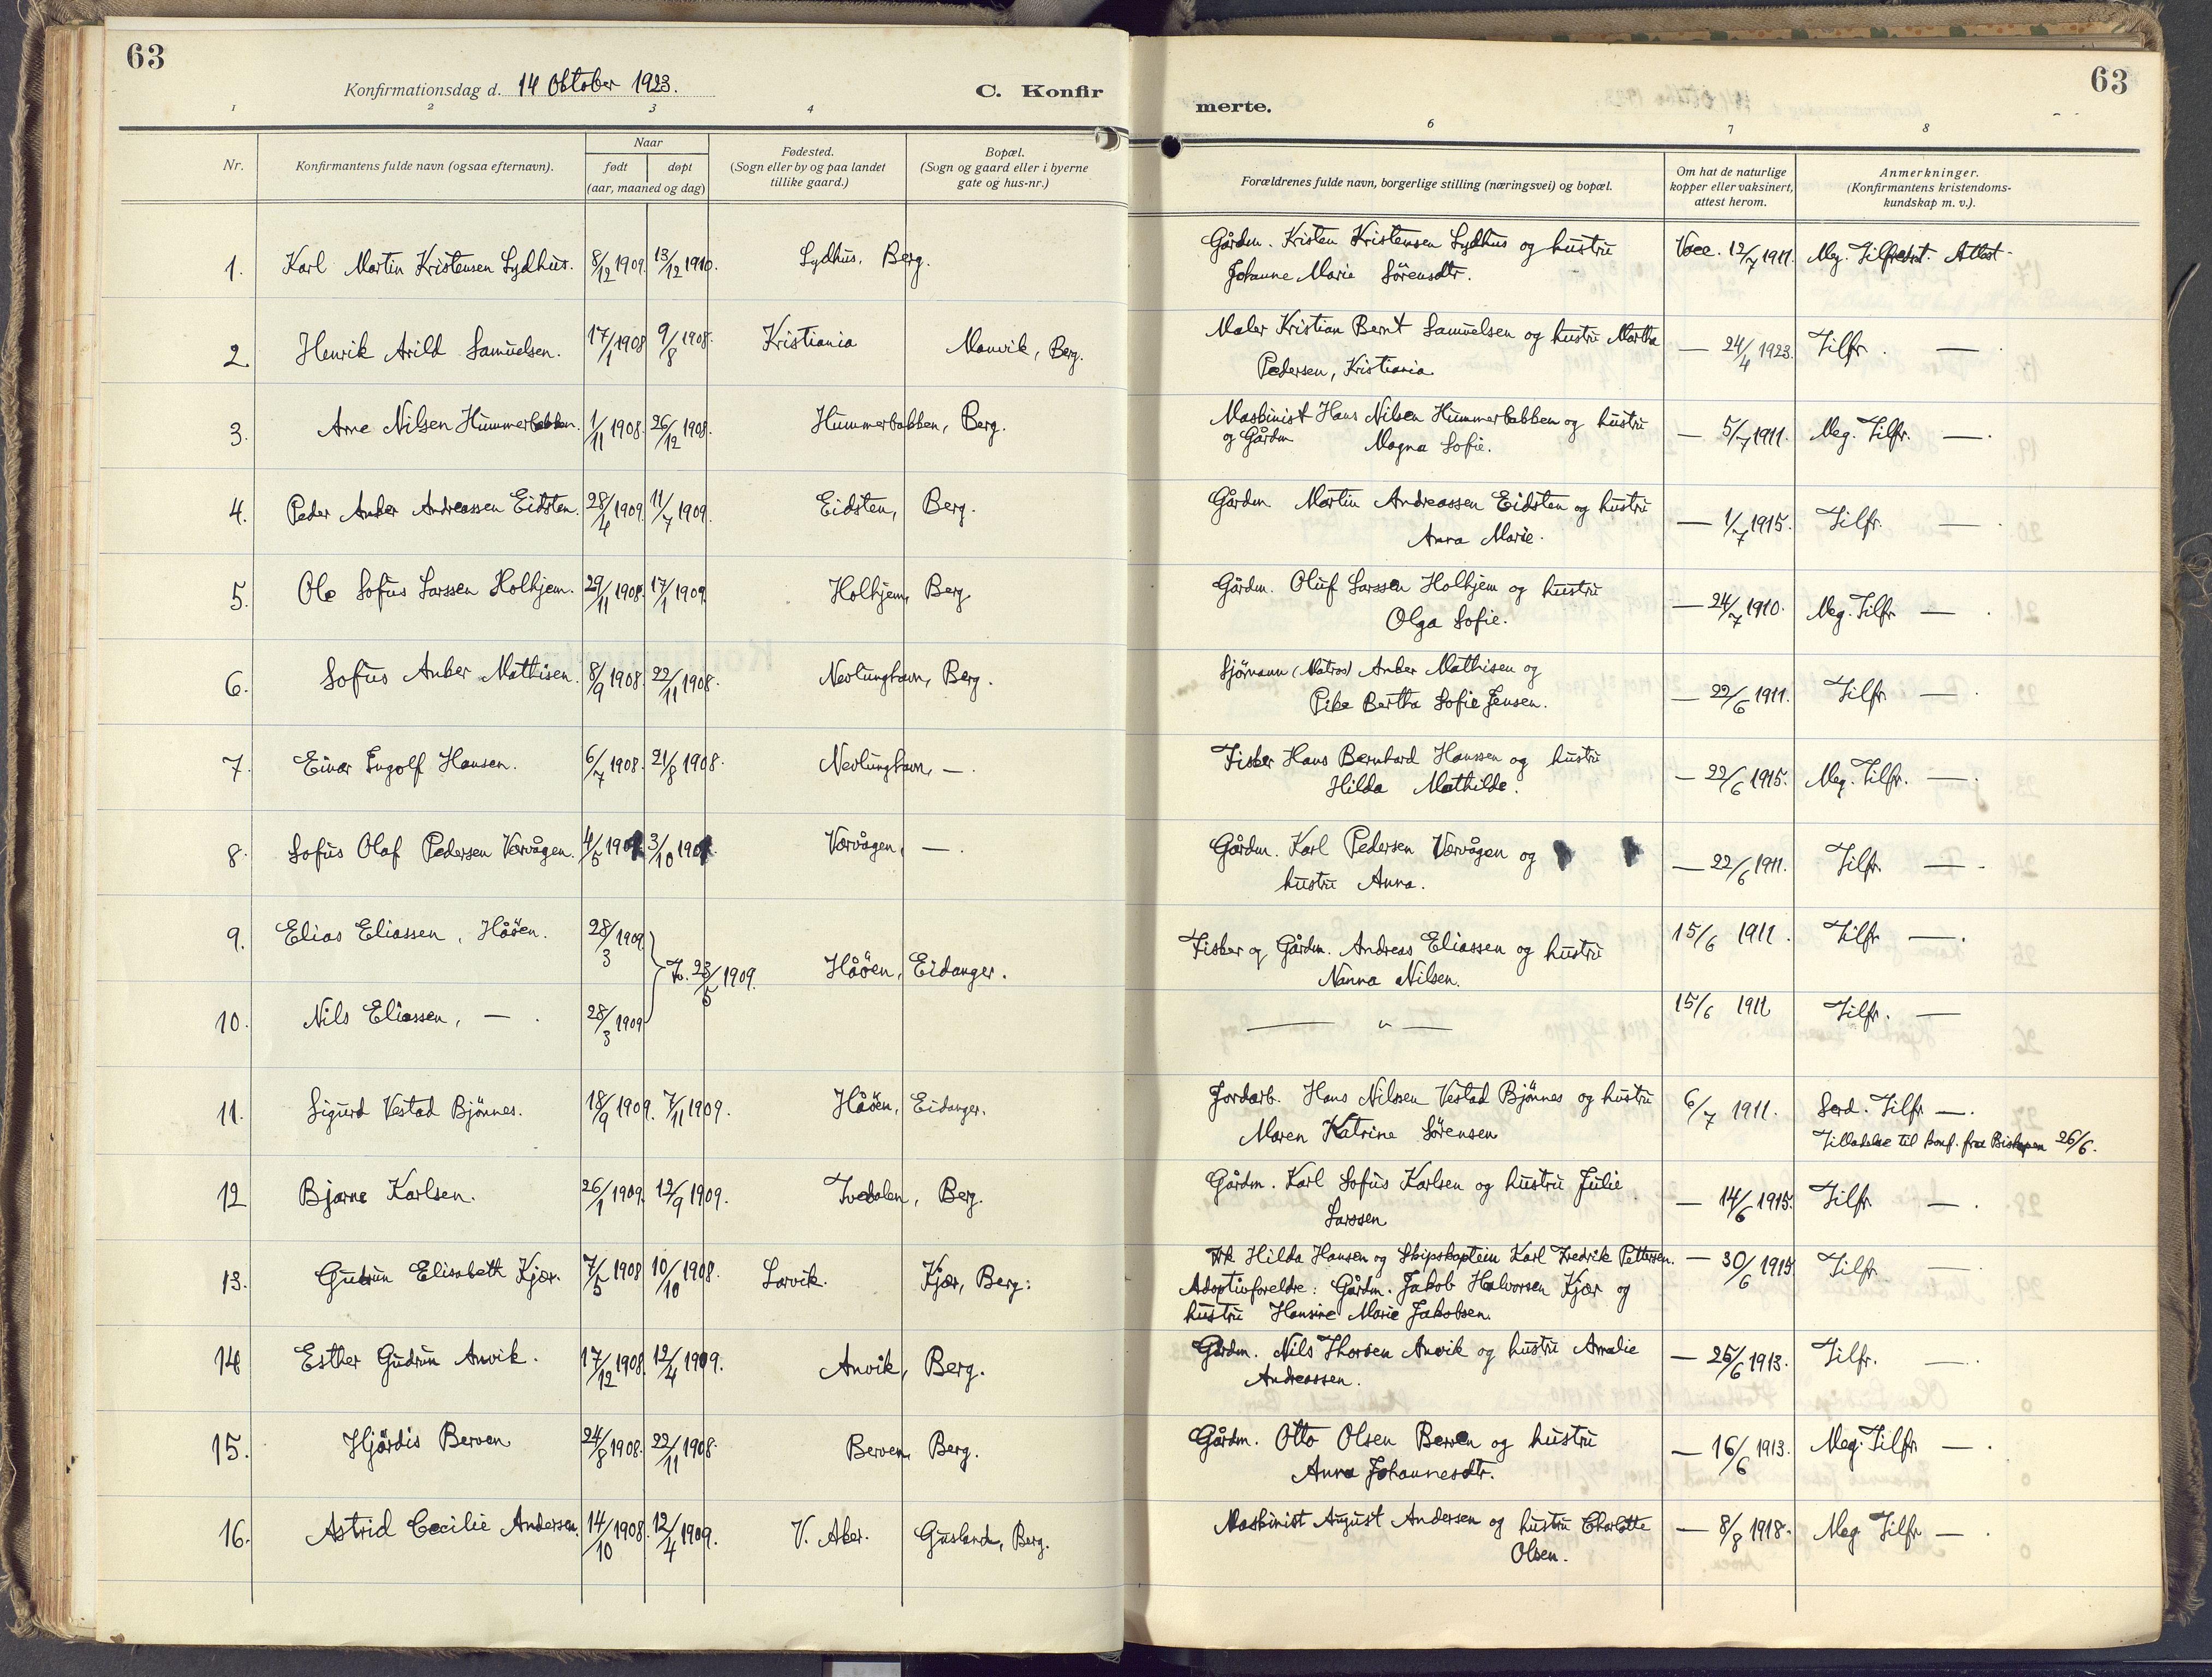 SAKO, Brunlanes kirkebøker, F/Fb/L0004: Ministerialbok nr. II 4, 1923-1940, s. 63